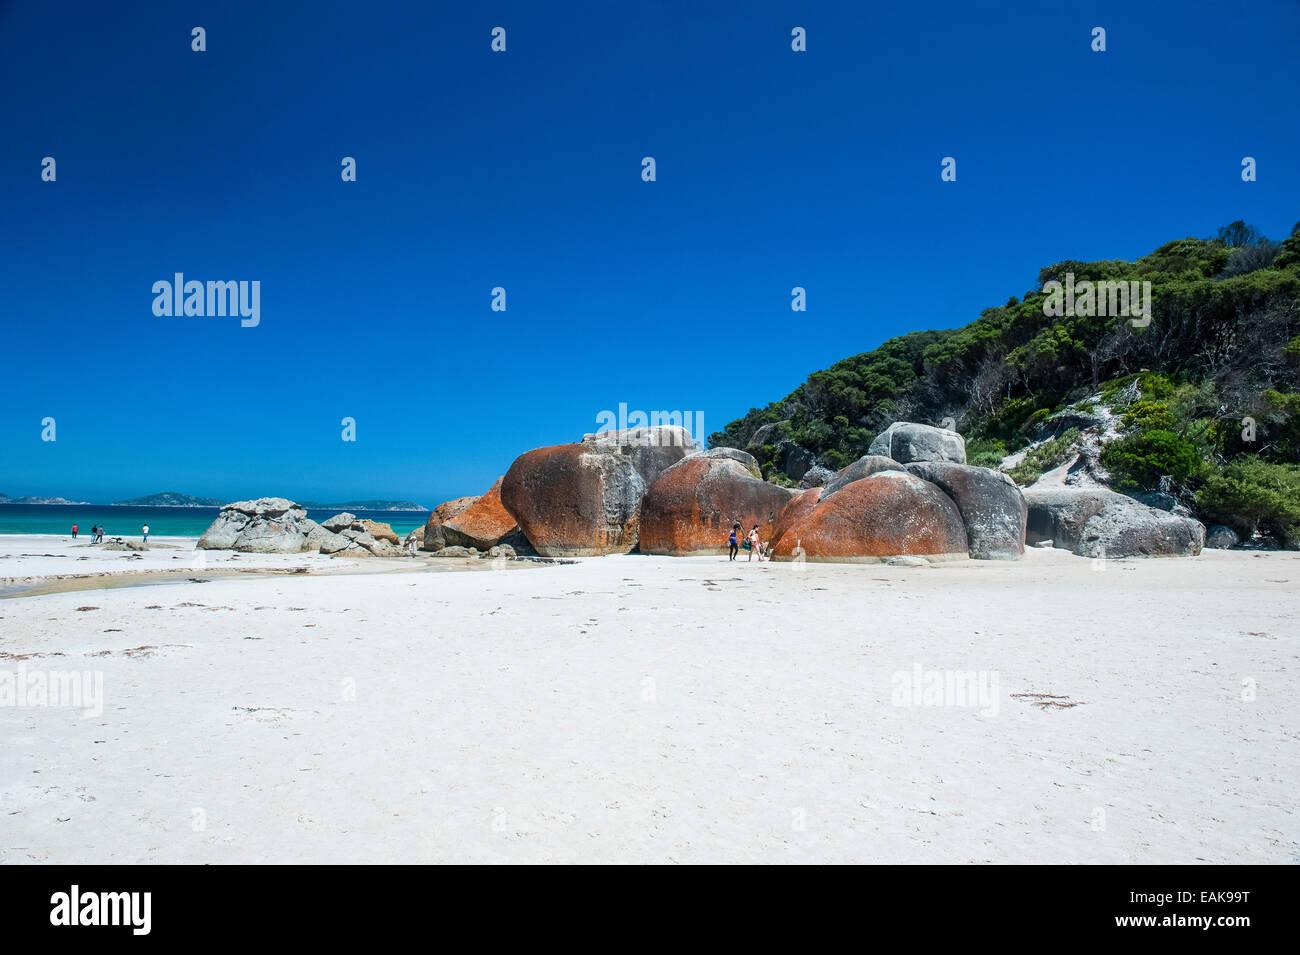 Norman Beach, Wilsons Promontory National Park, Victoria, Australia - Stock Image